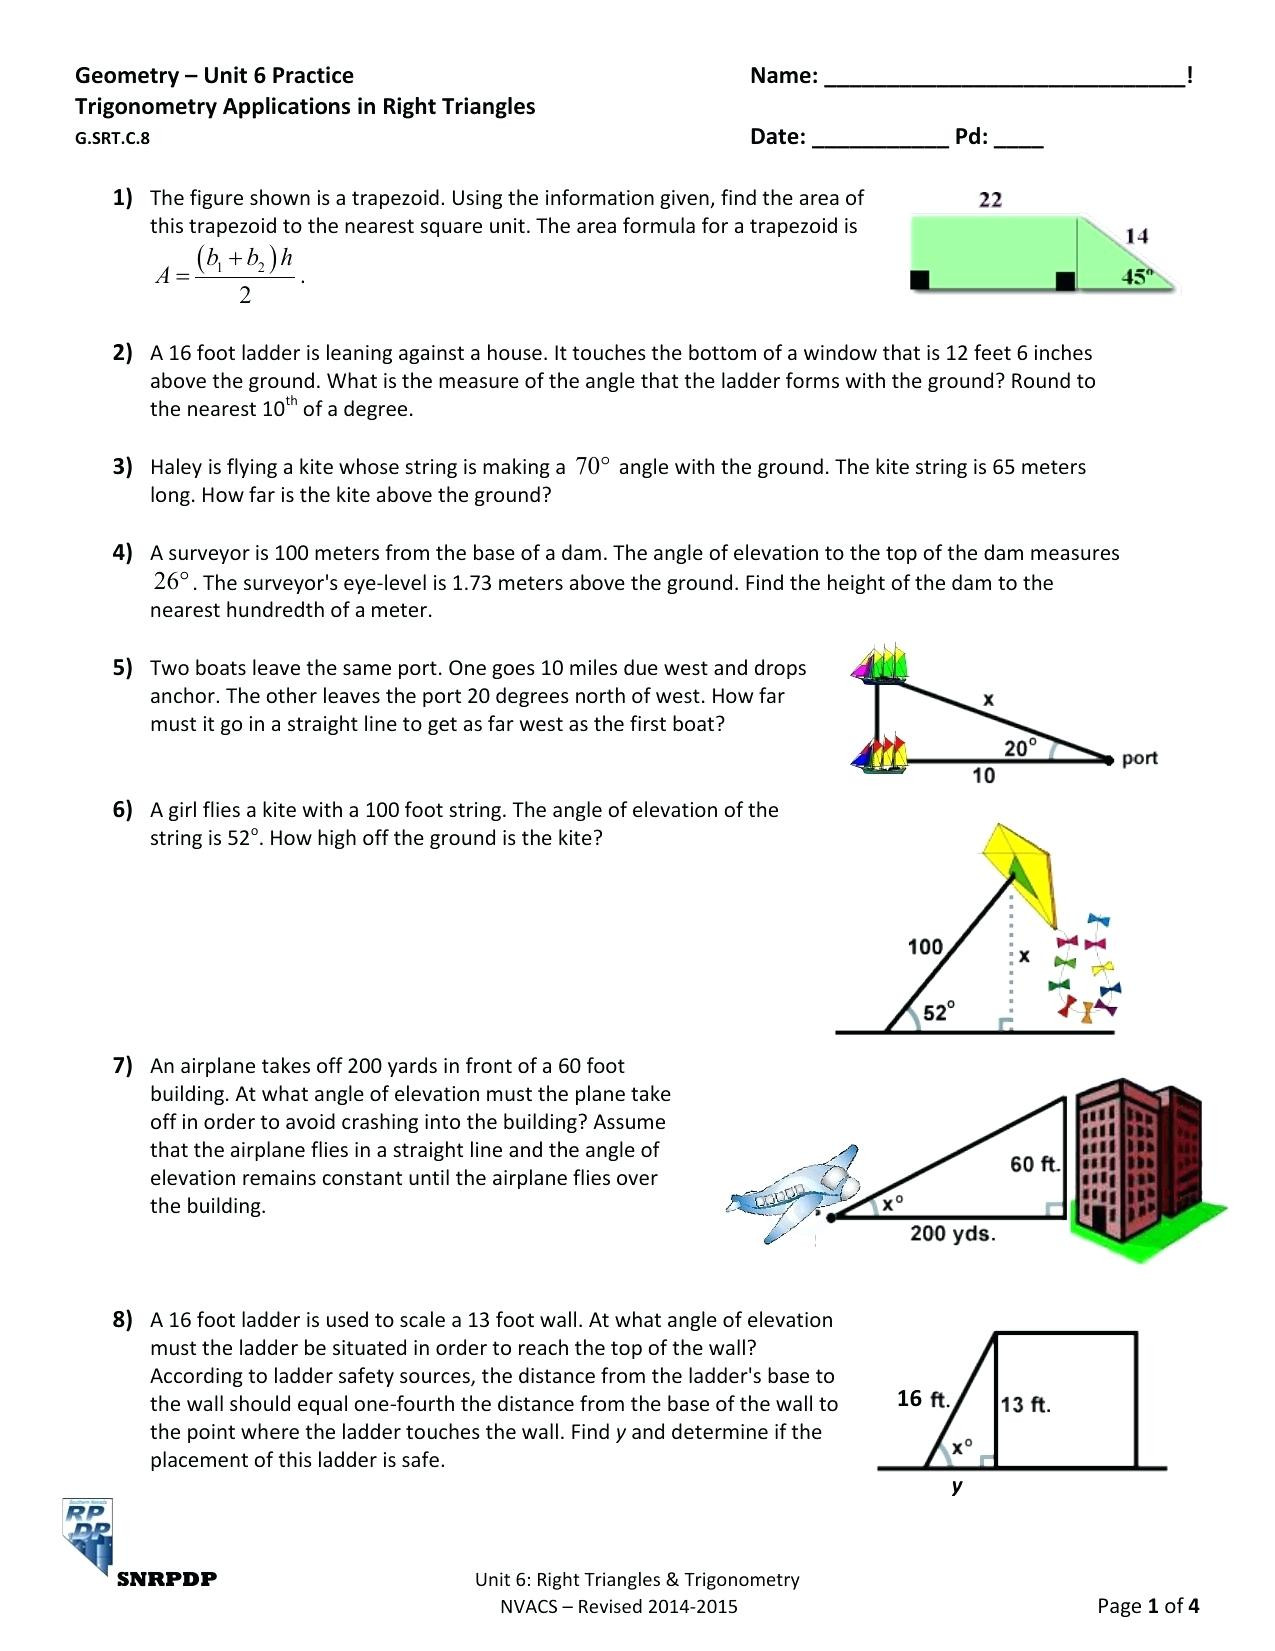 Trig Word Problems Worksheet Answers Trigonometry Angle Elevation Worksheet